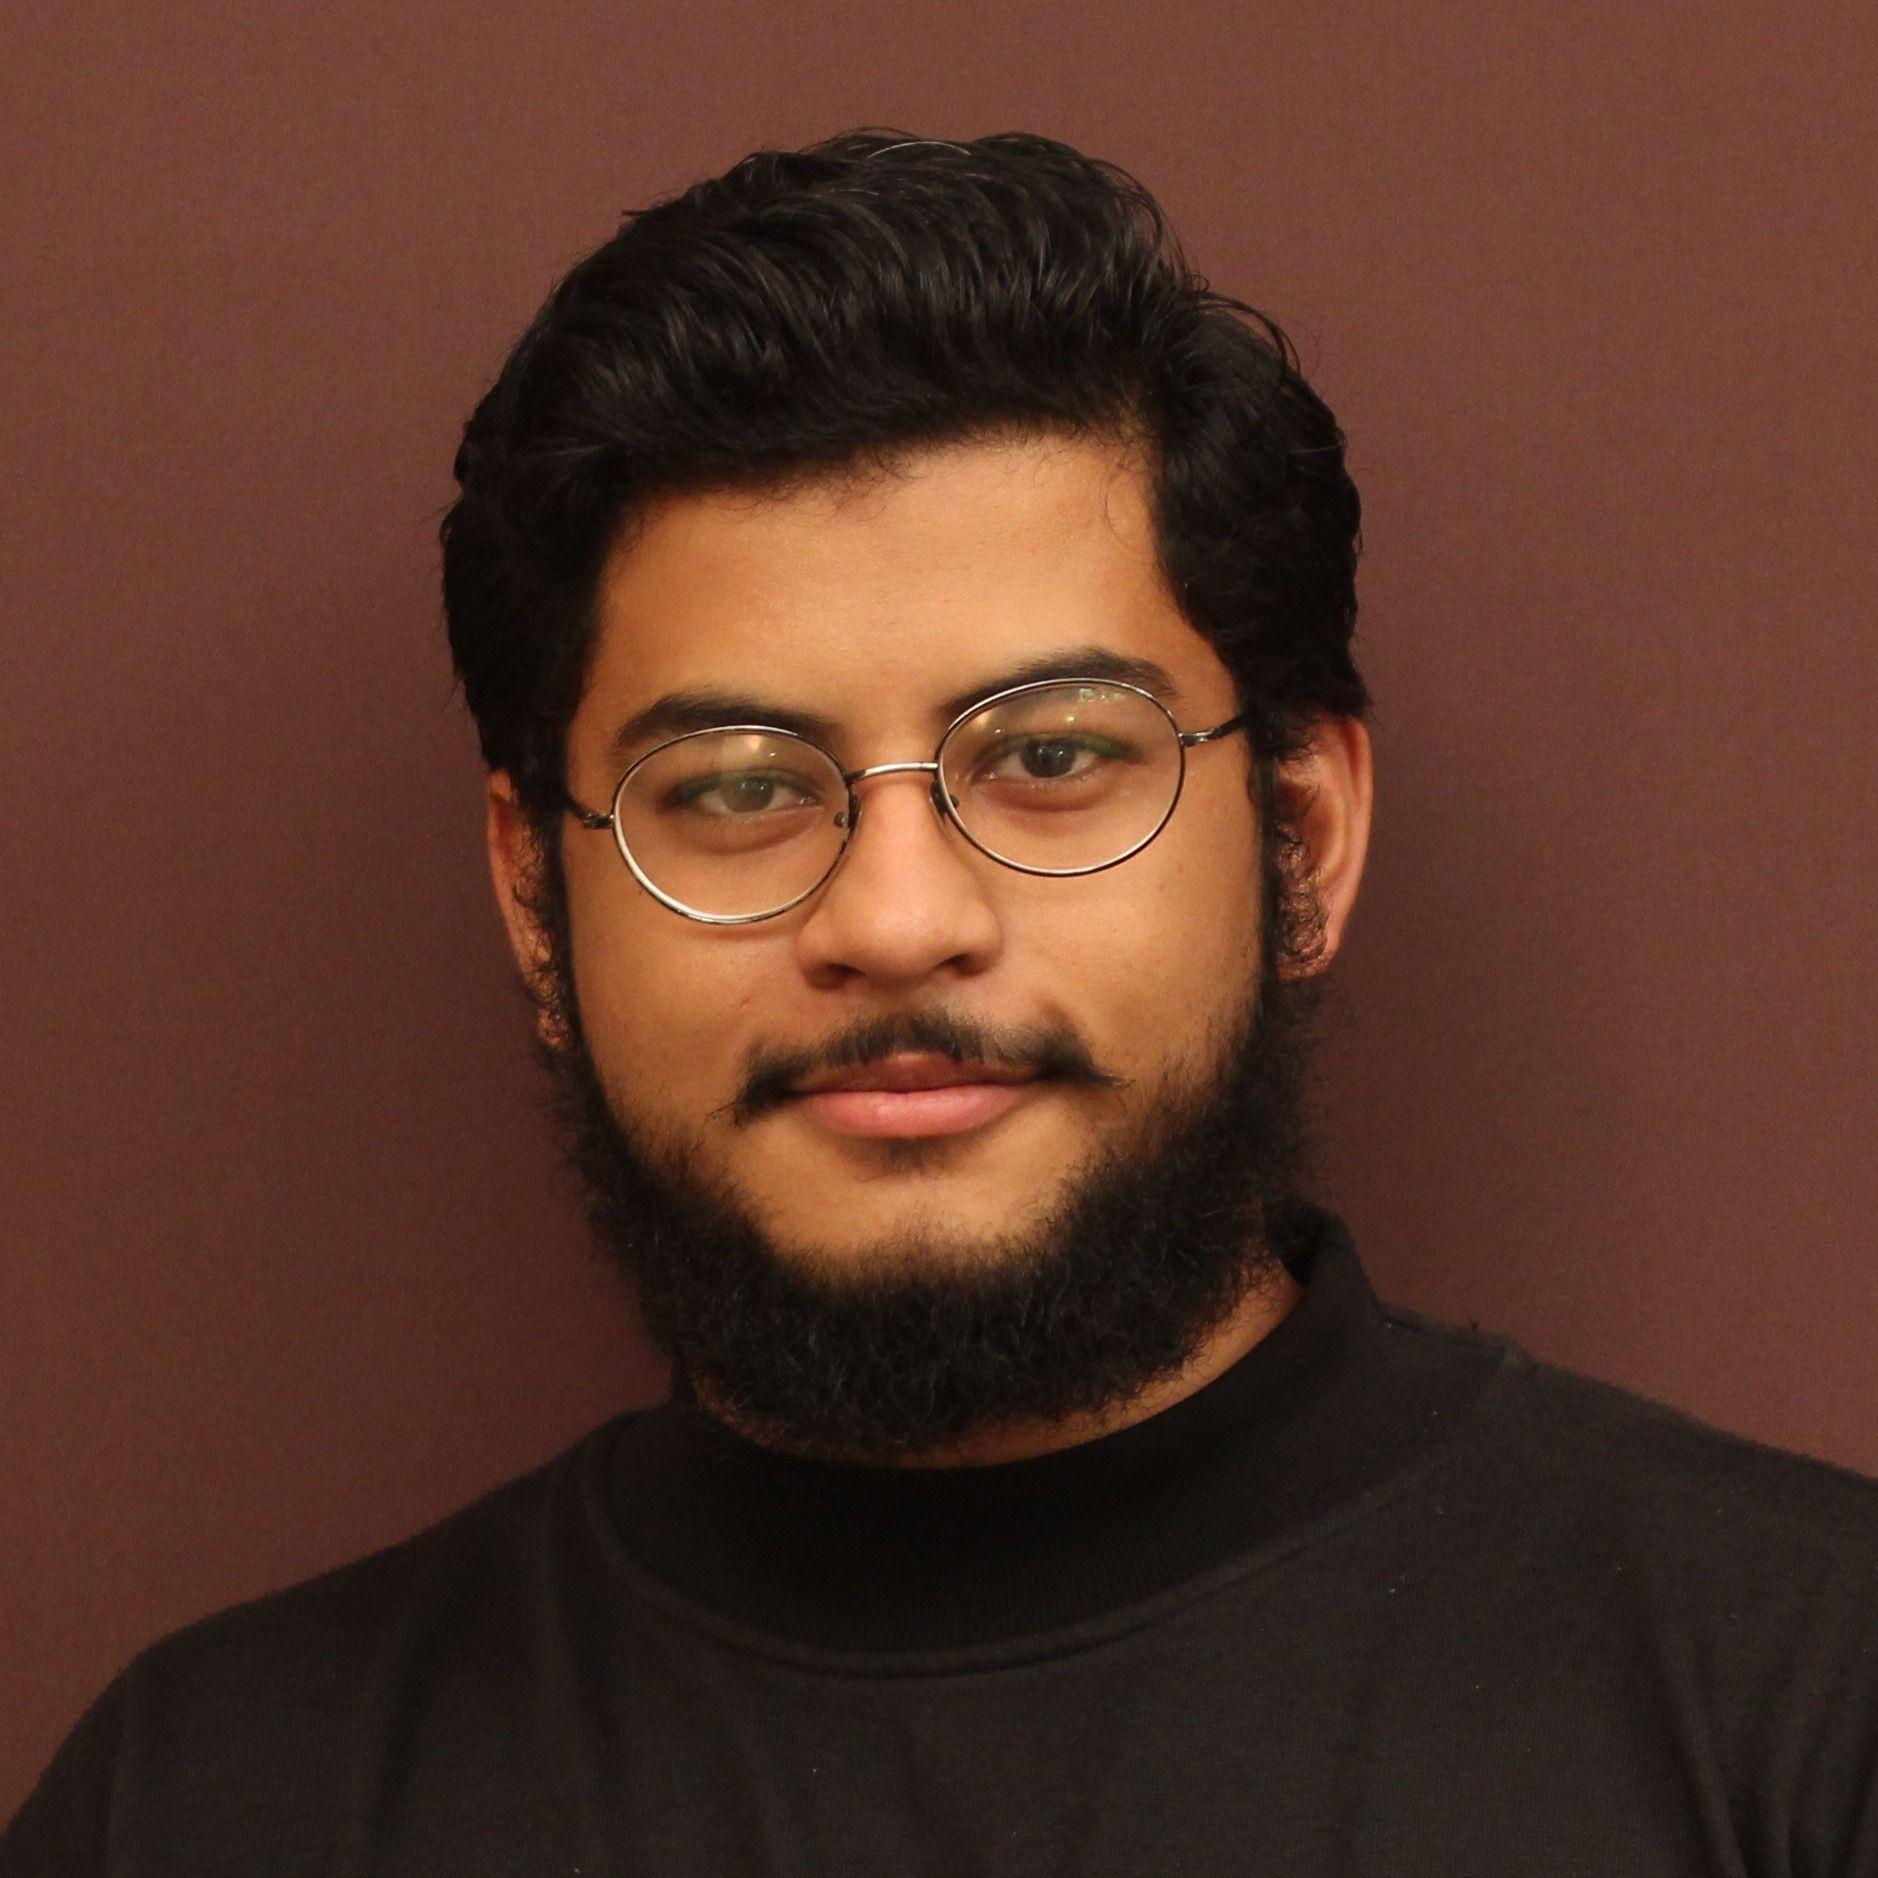 Hasan Ali Hacker Noon profile picture